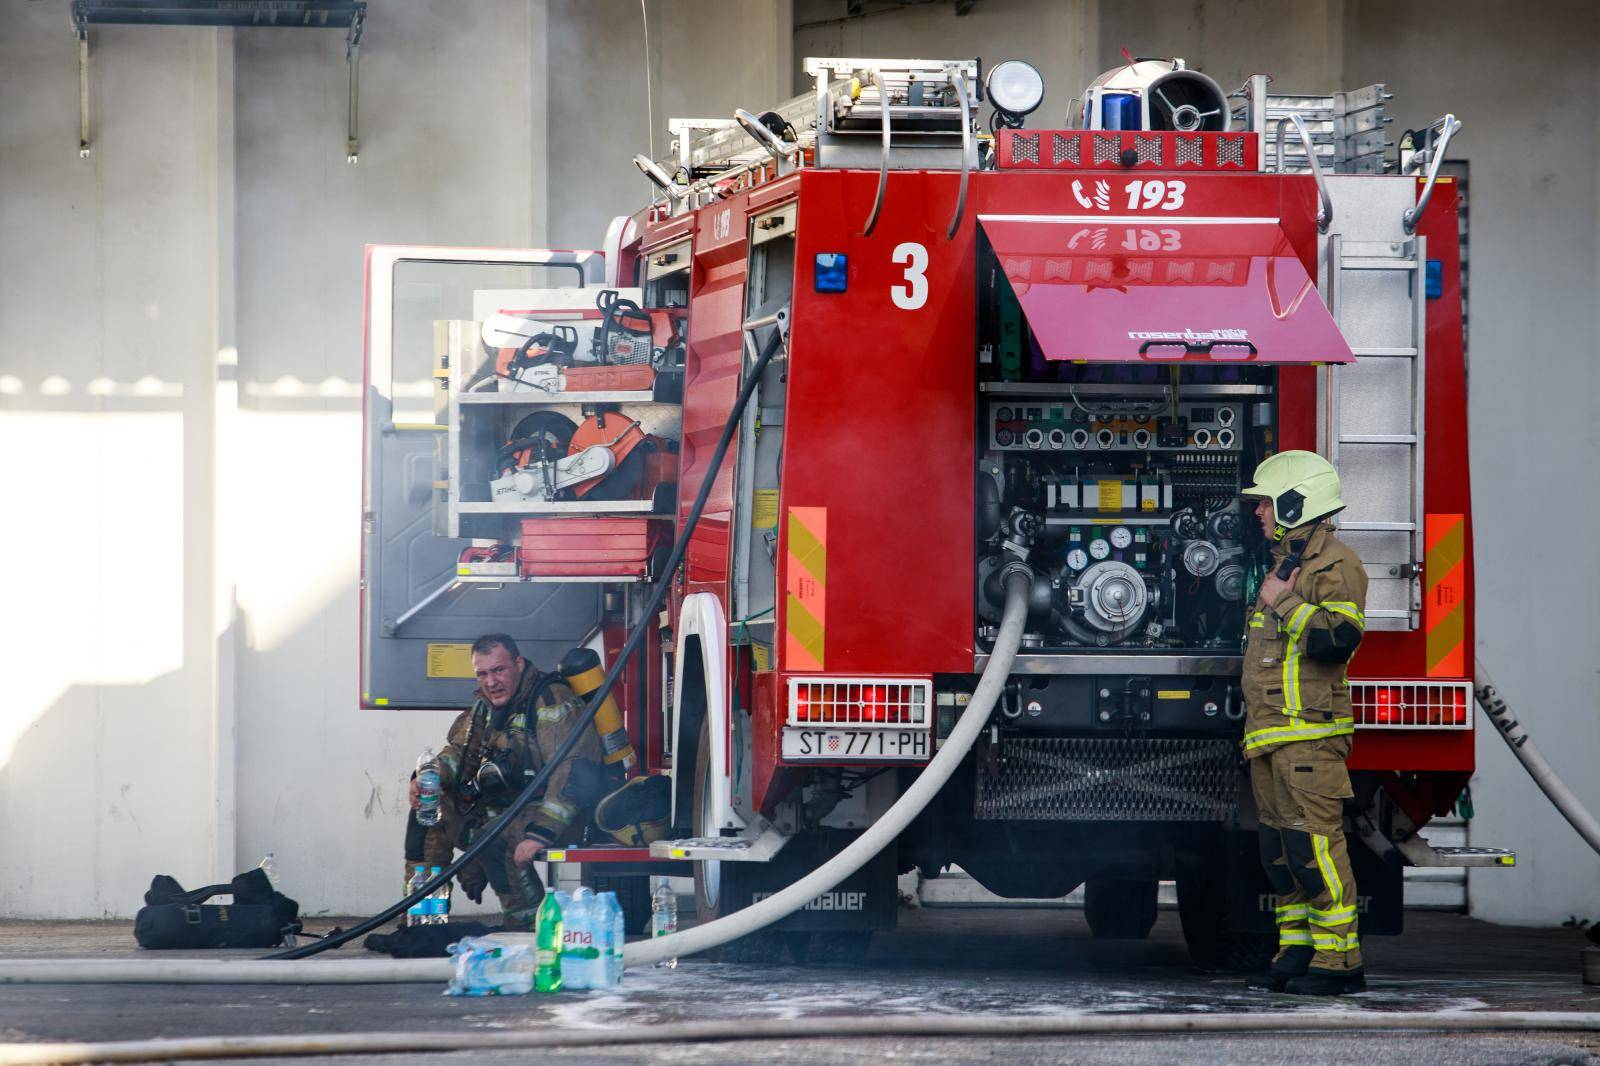 Opet požar u splitskom TTTS-u: Izgorjelo je osam kombija